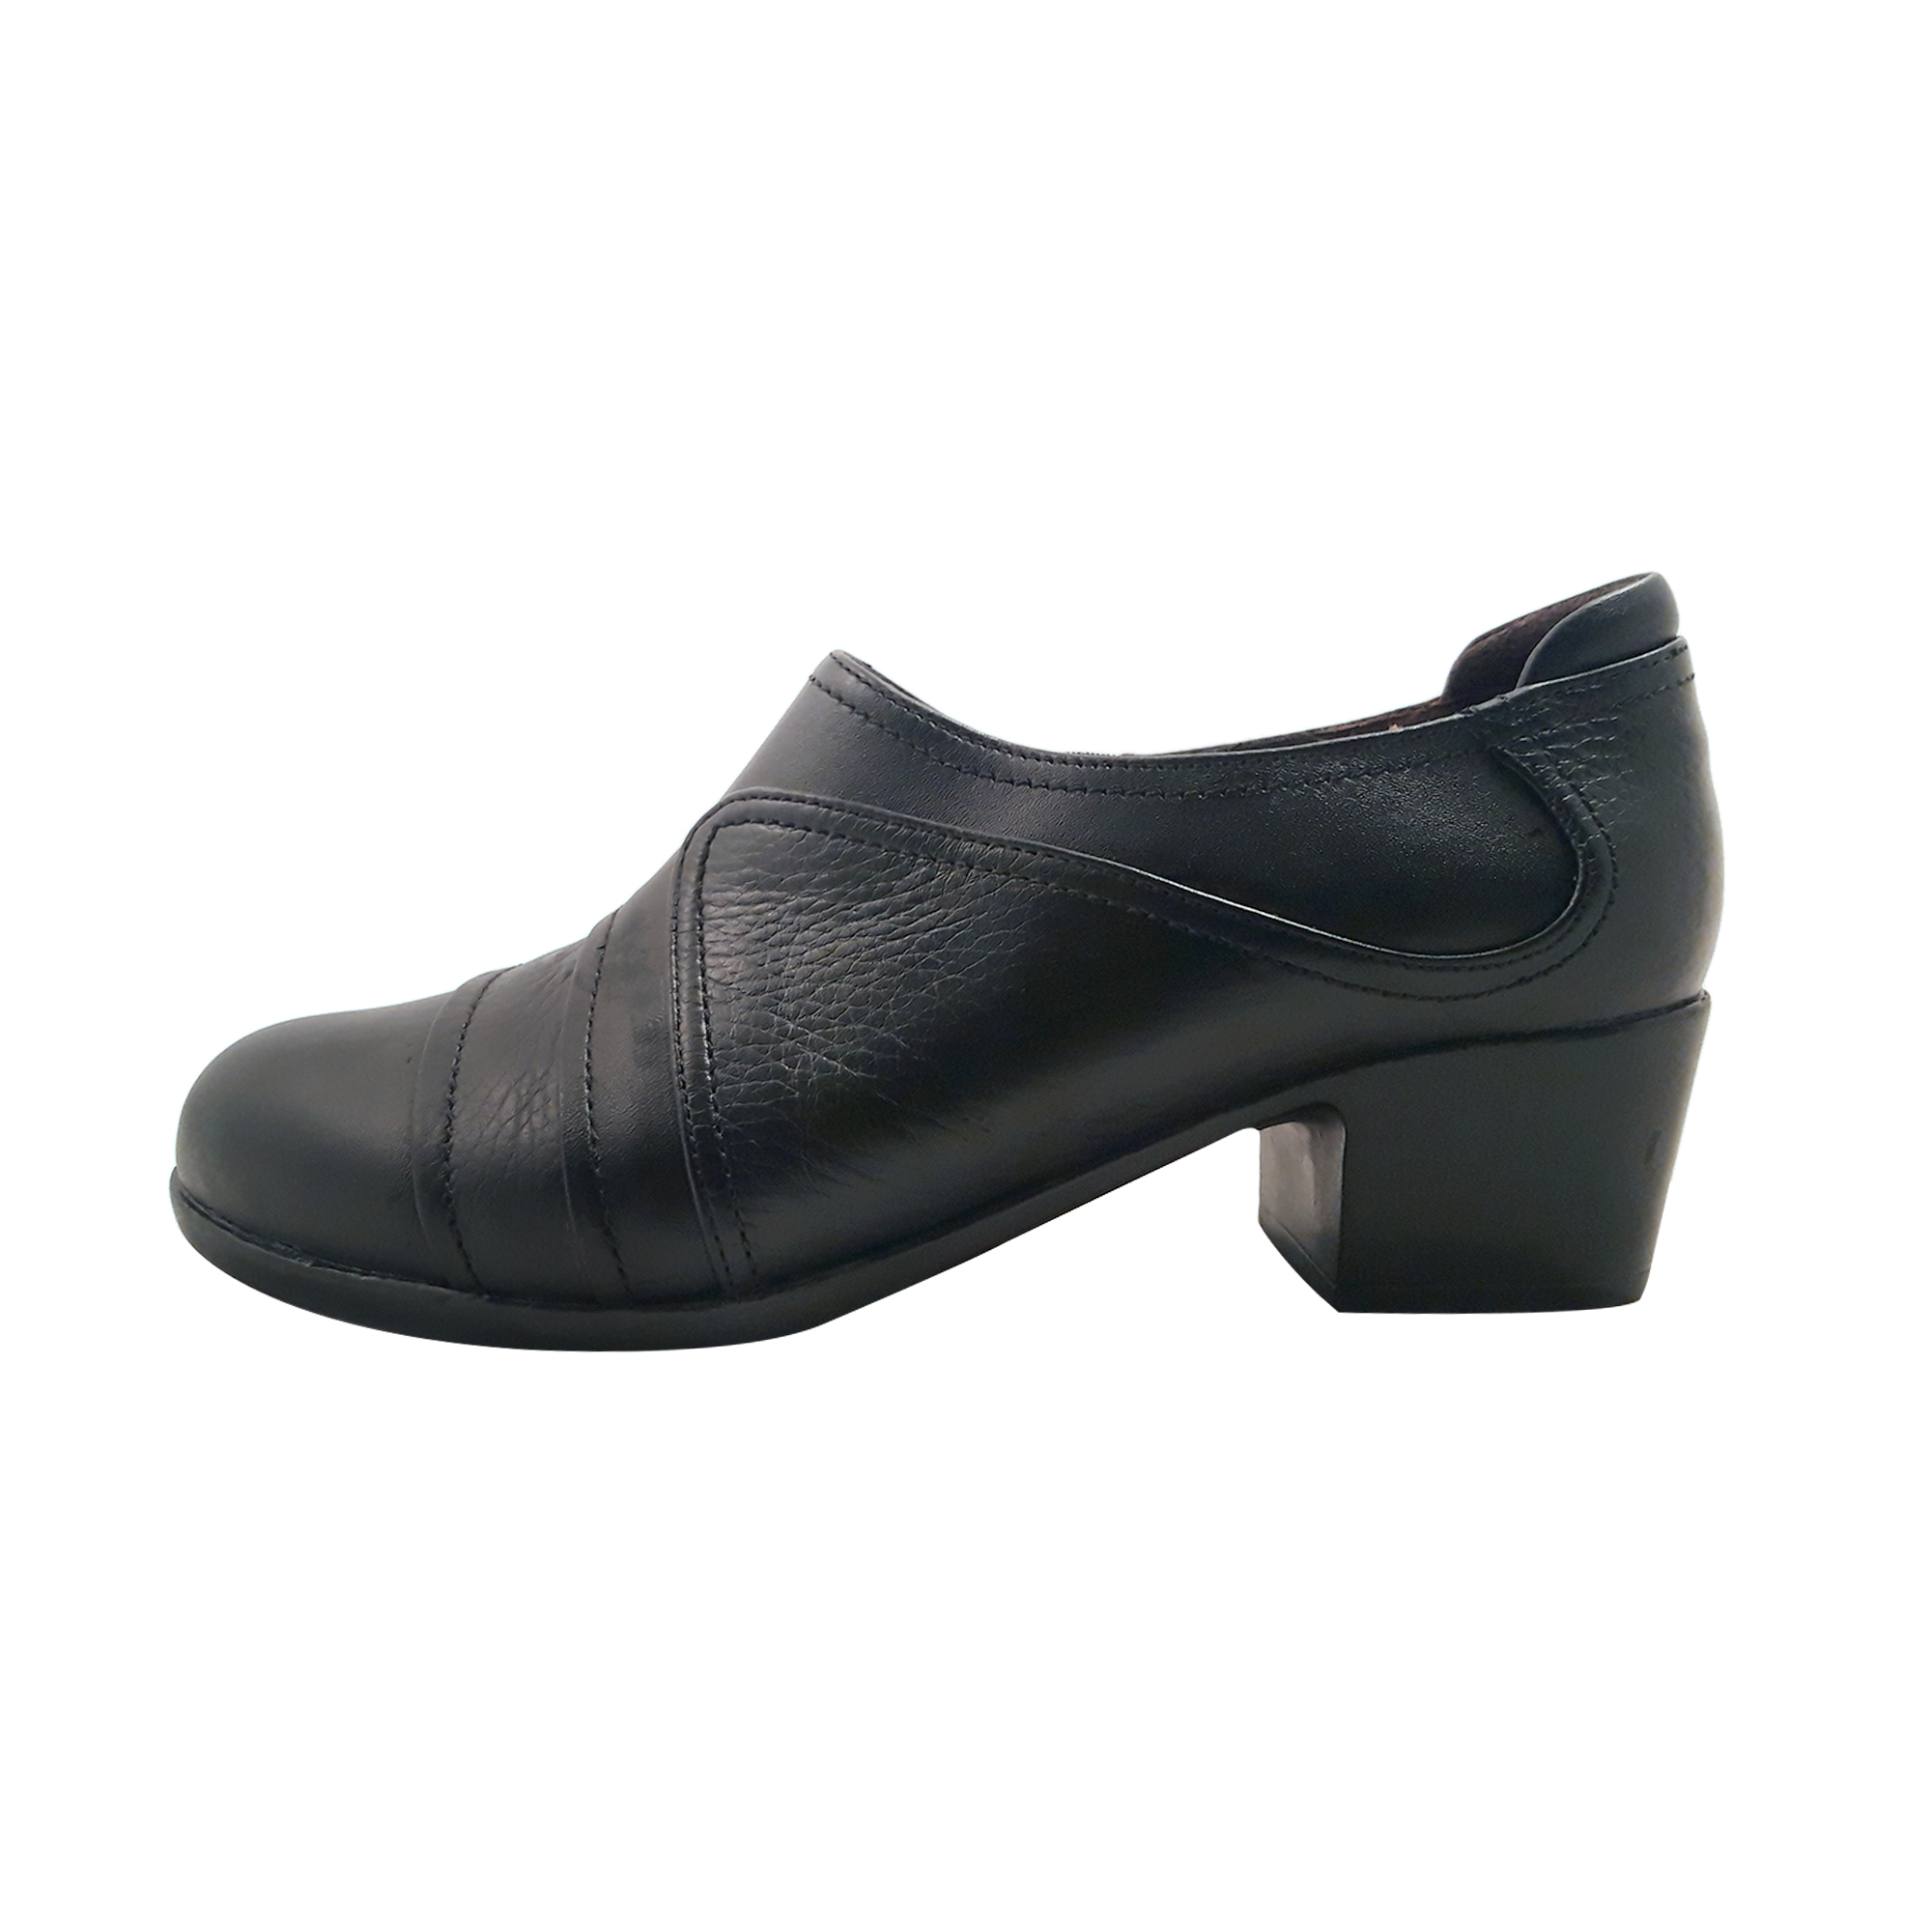 خرید                      کفش زنانه روشن مدل پانیذ کد 01